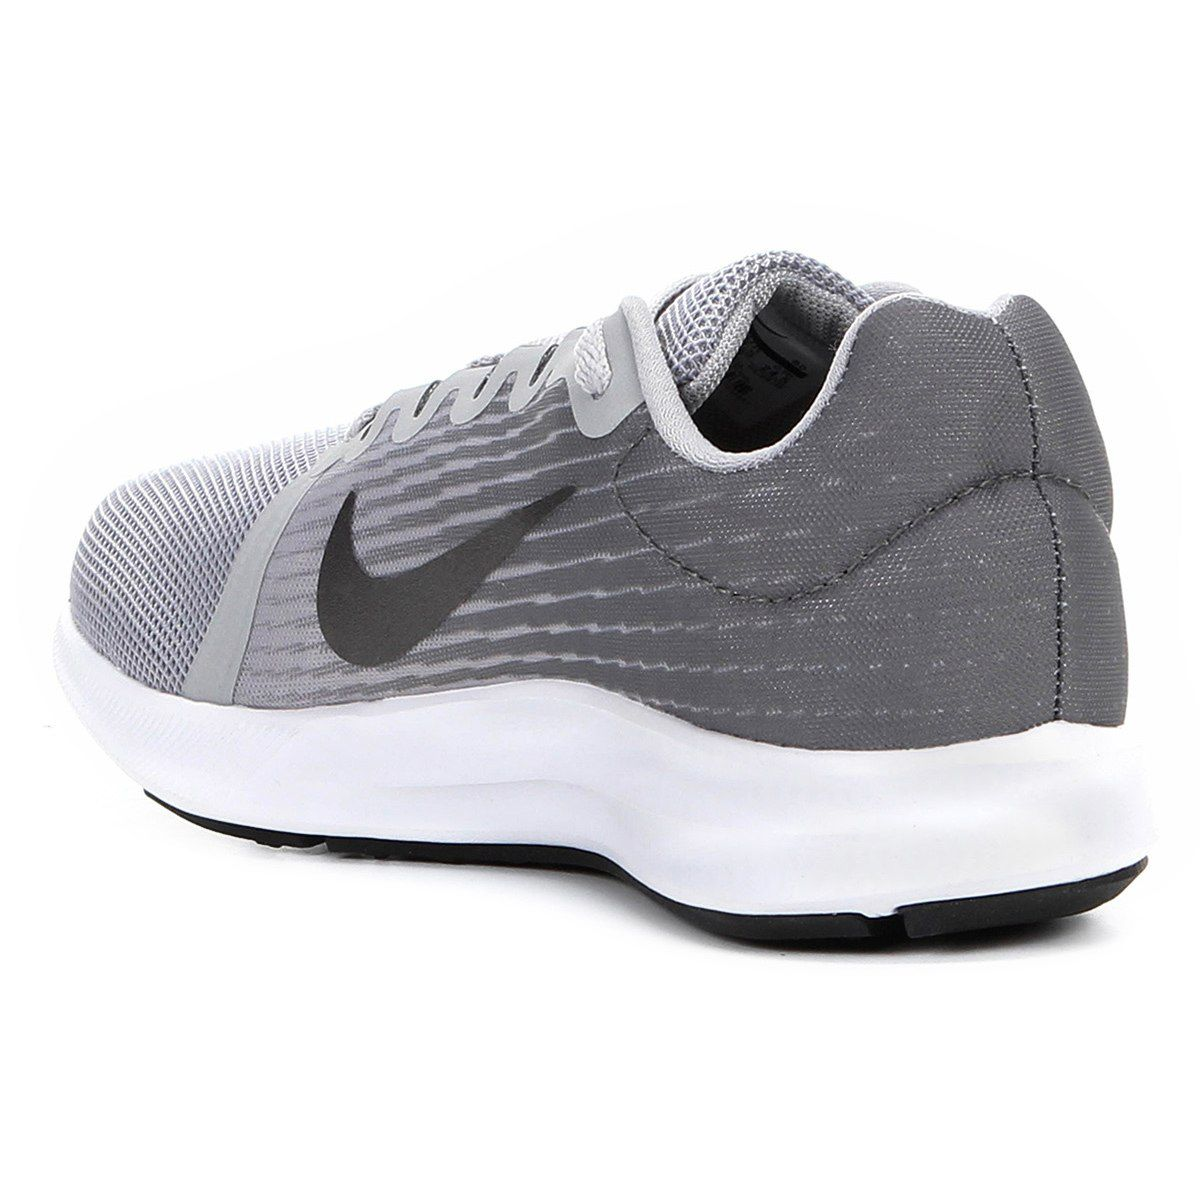 76d95f8f57 Tênis Nike Downshifter 8 Feminino - Cinza Preto - Joinville Sportcenter